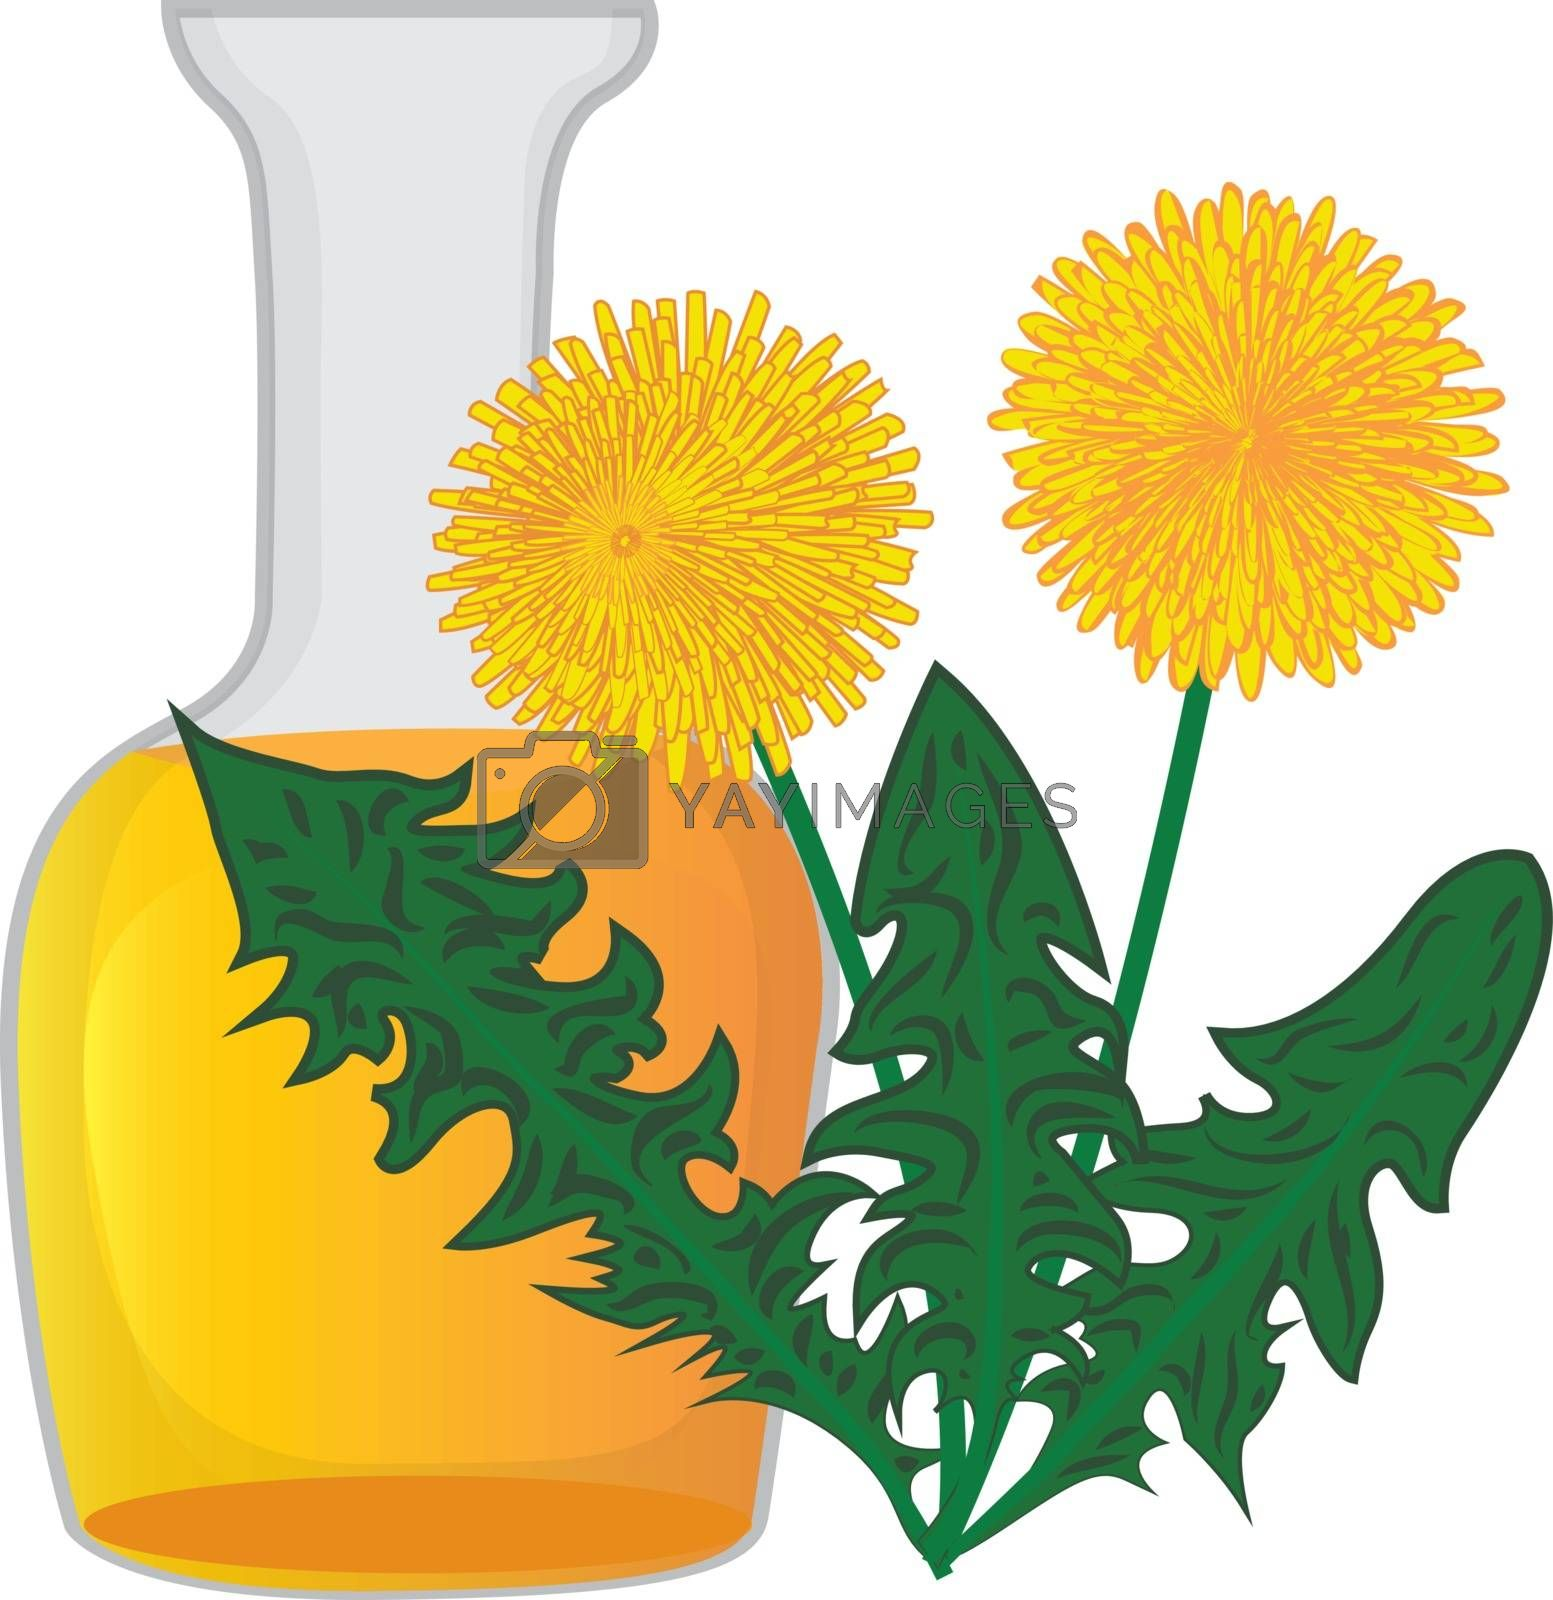 Dandelion essential oil by Olena758